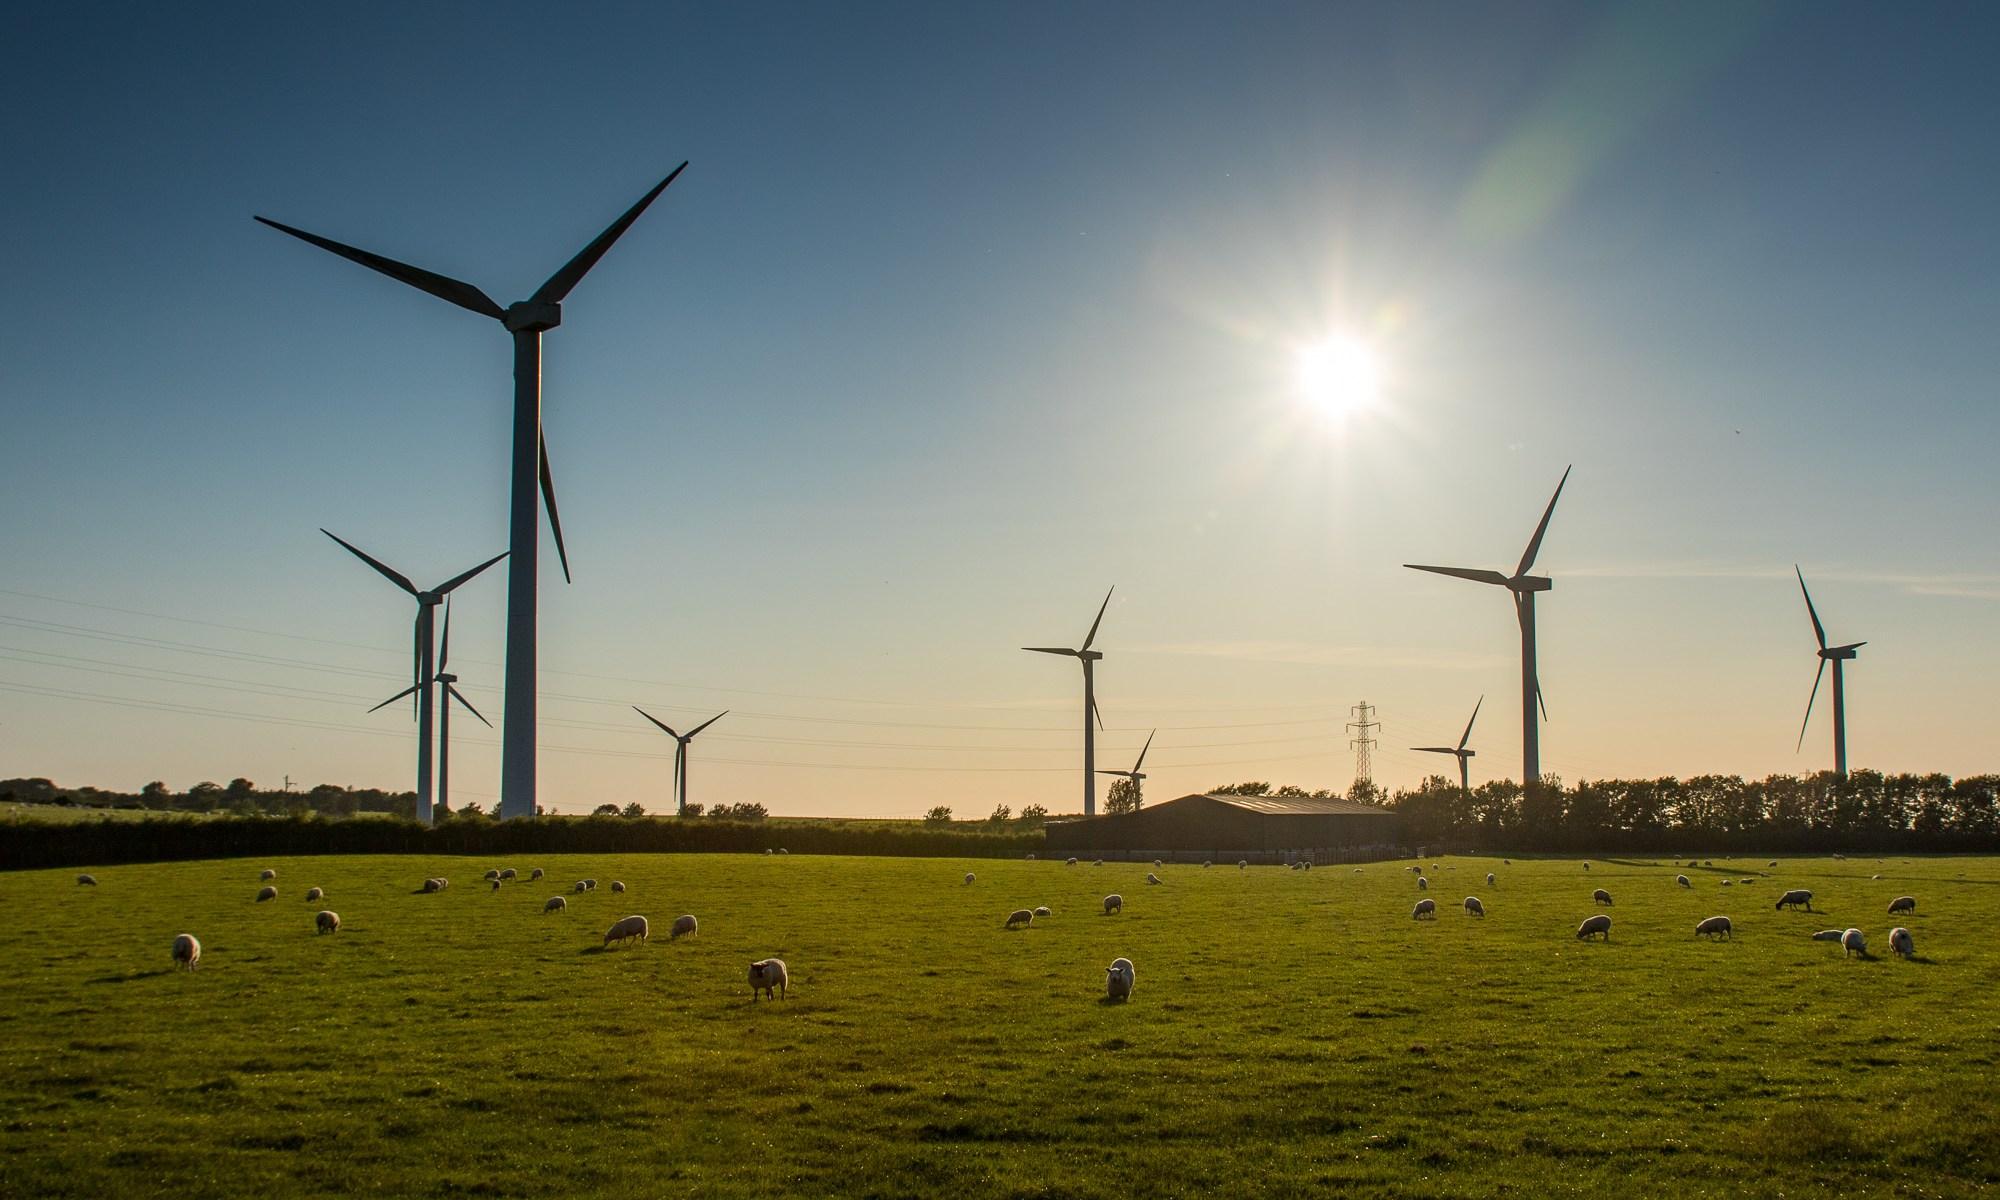 Winscales Moor Wind Farm